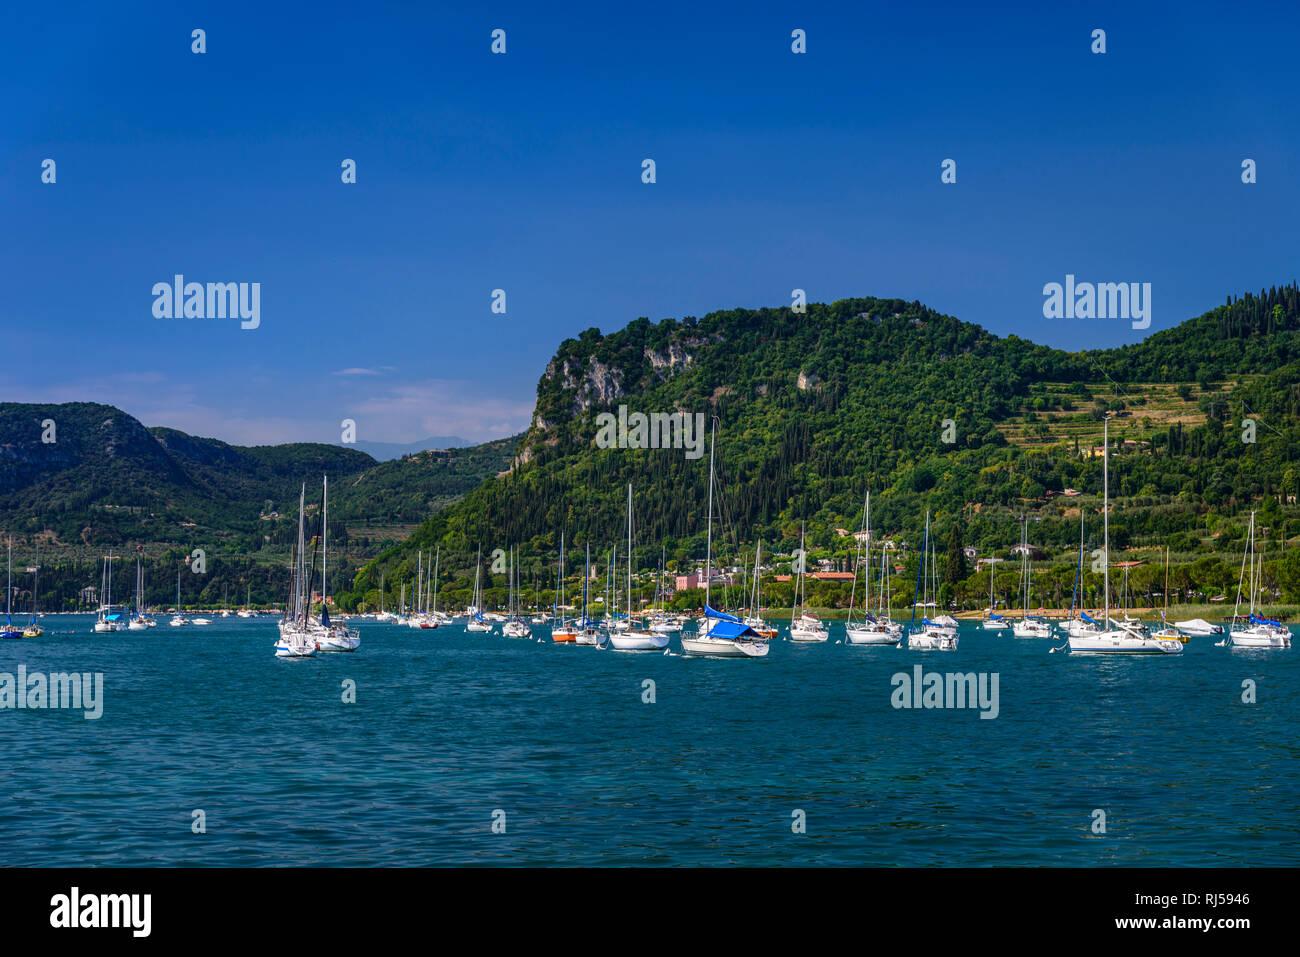 Italien, Venetien, Gardasee, Bardolino, Segelboothafen gegen Tafelberg Rocca Vecchia - Stock Image